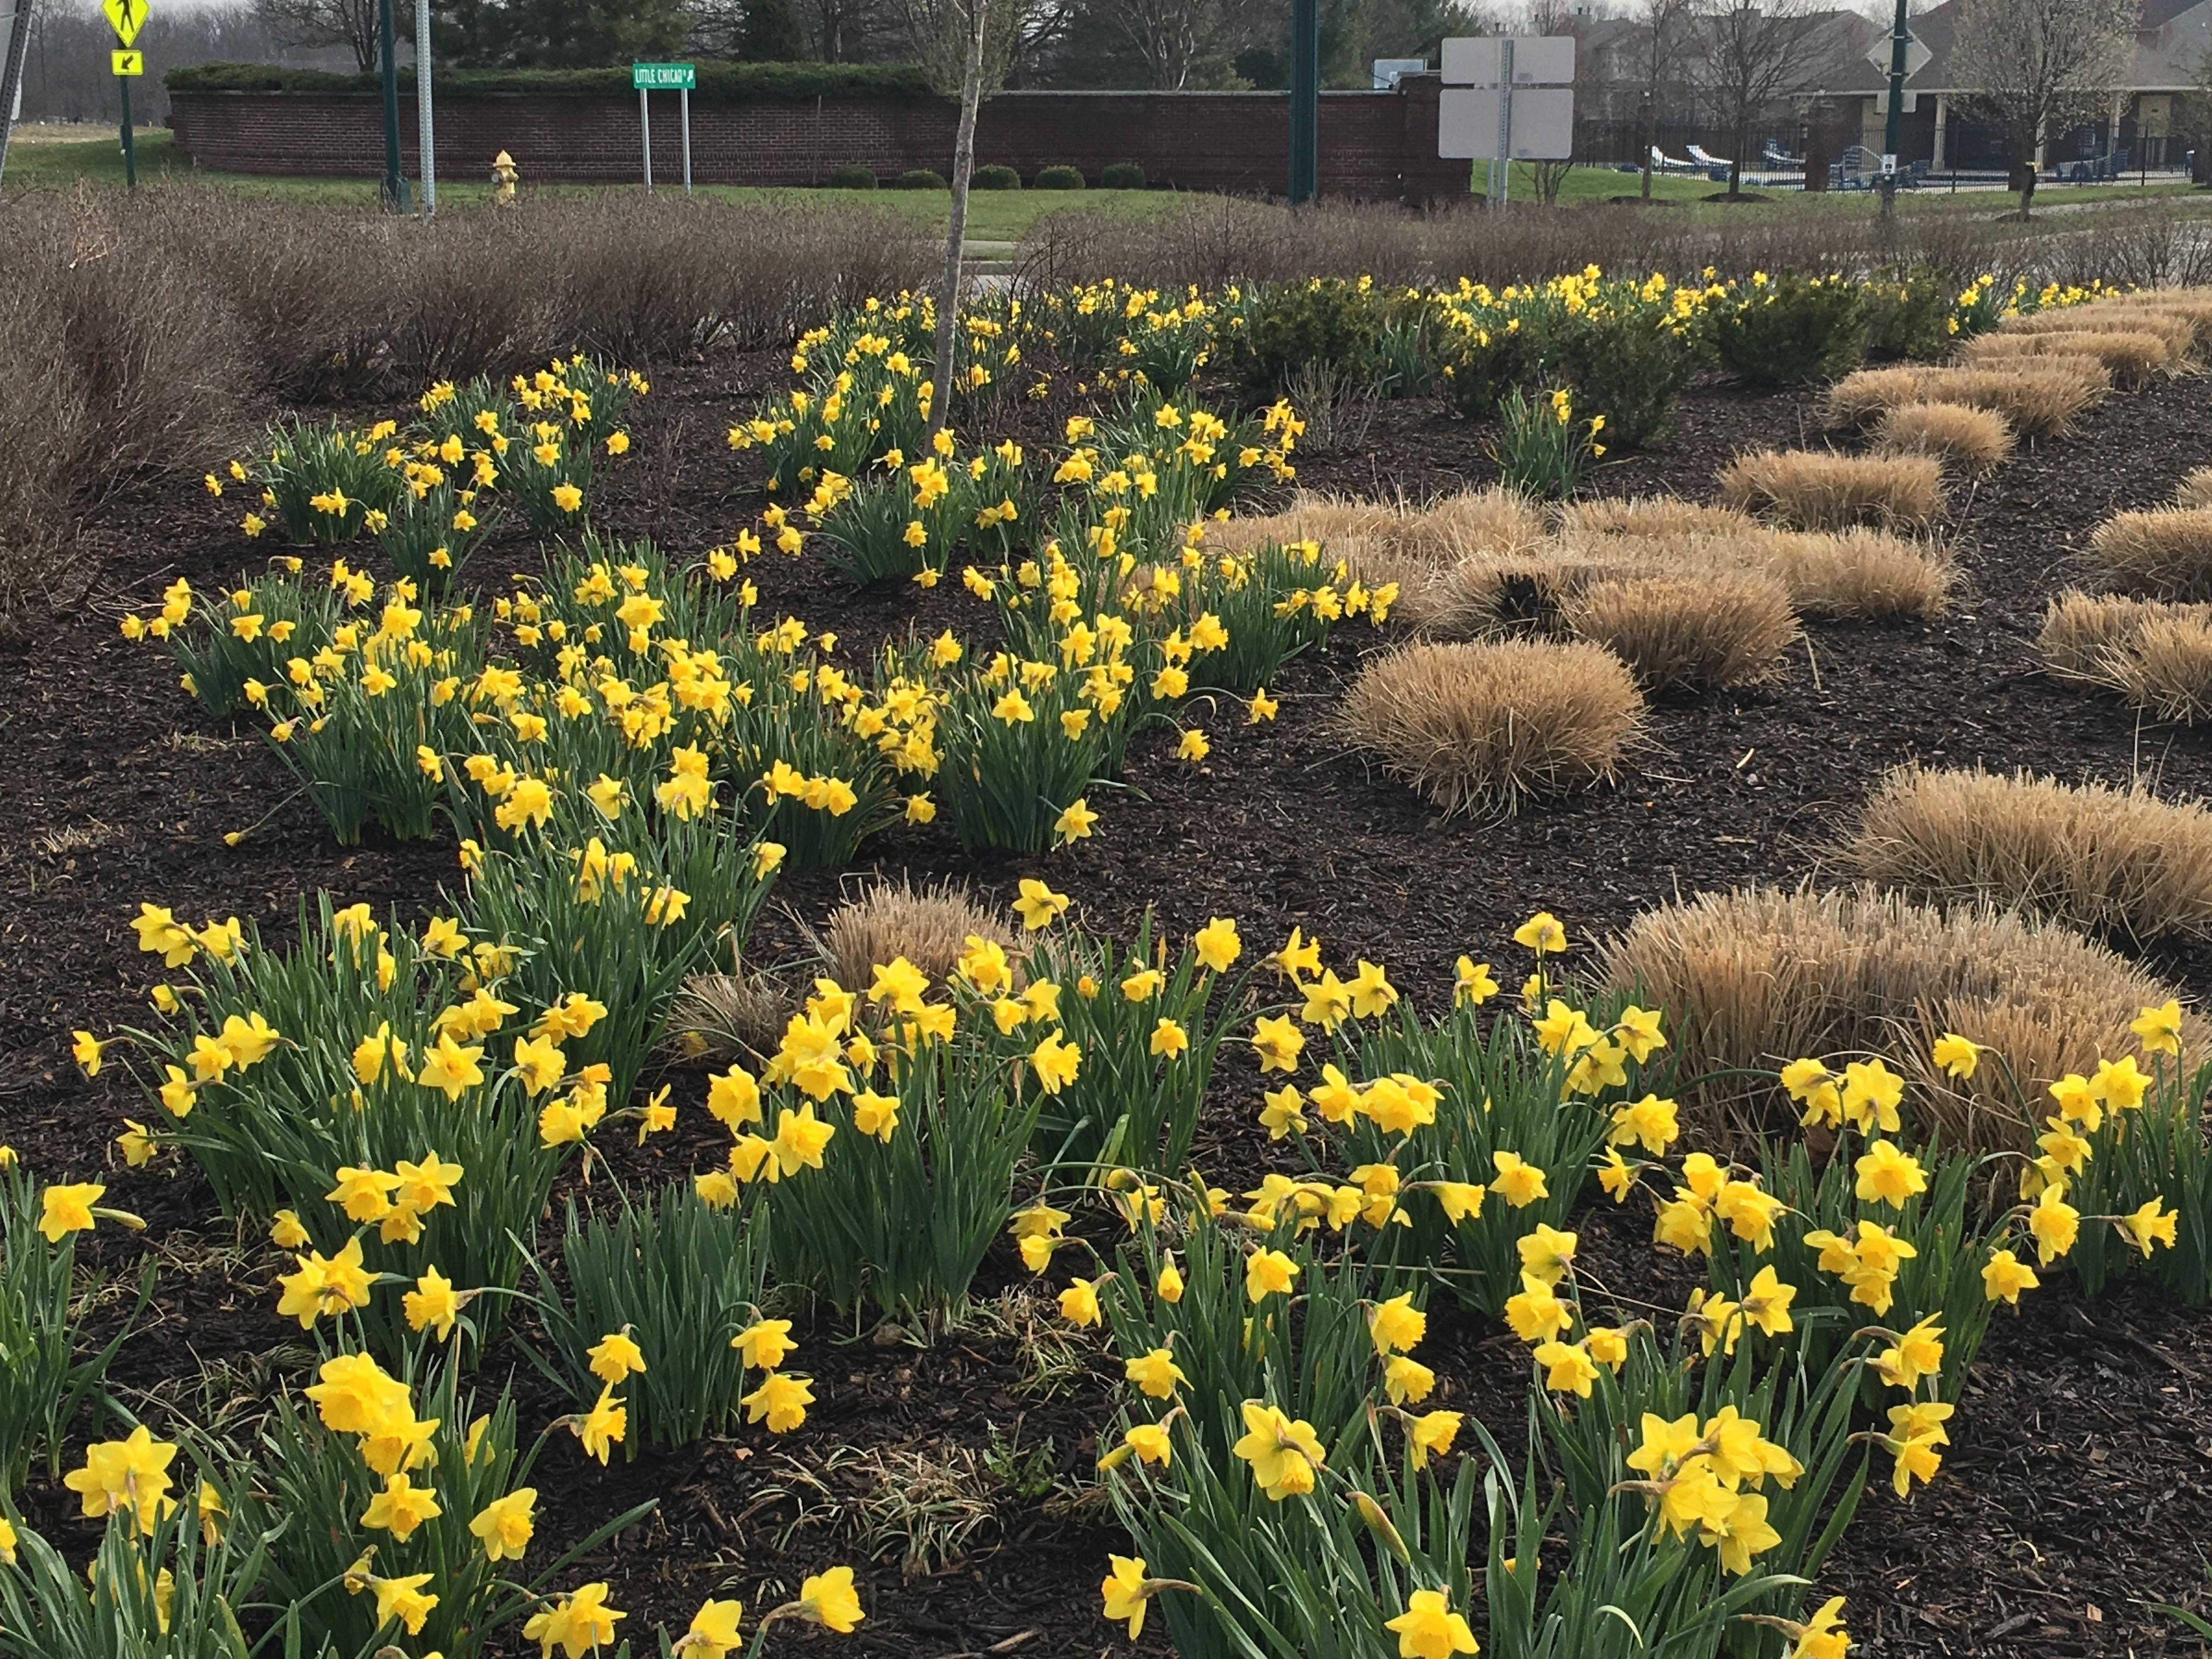 Hipstoric Downtownnoblesville Springflowers